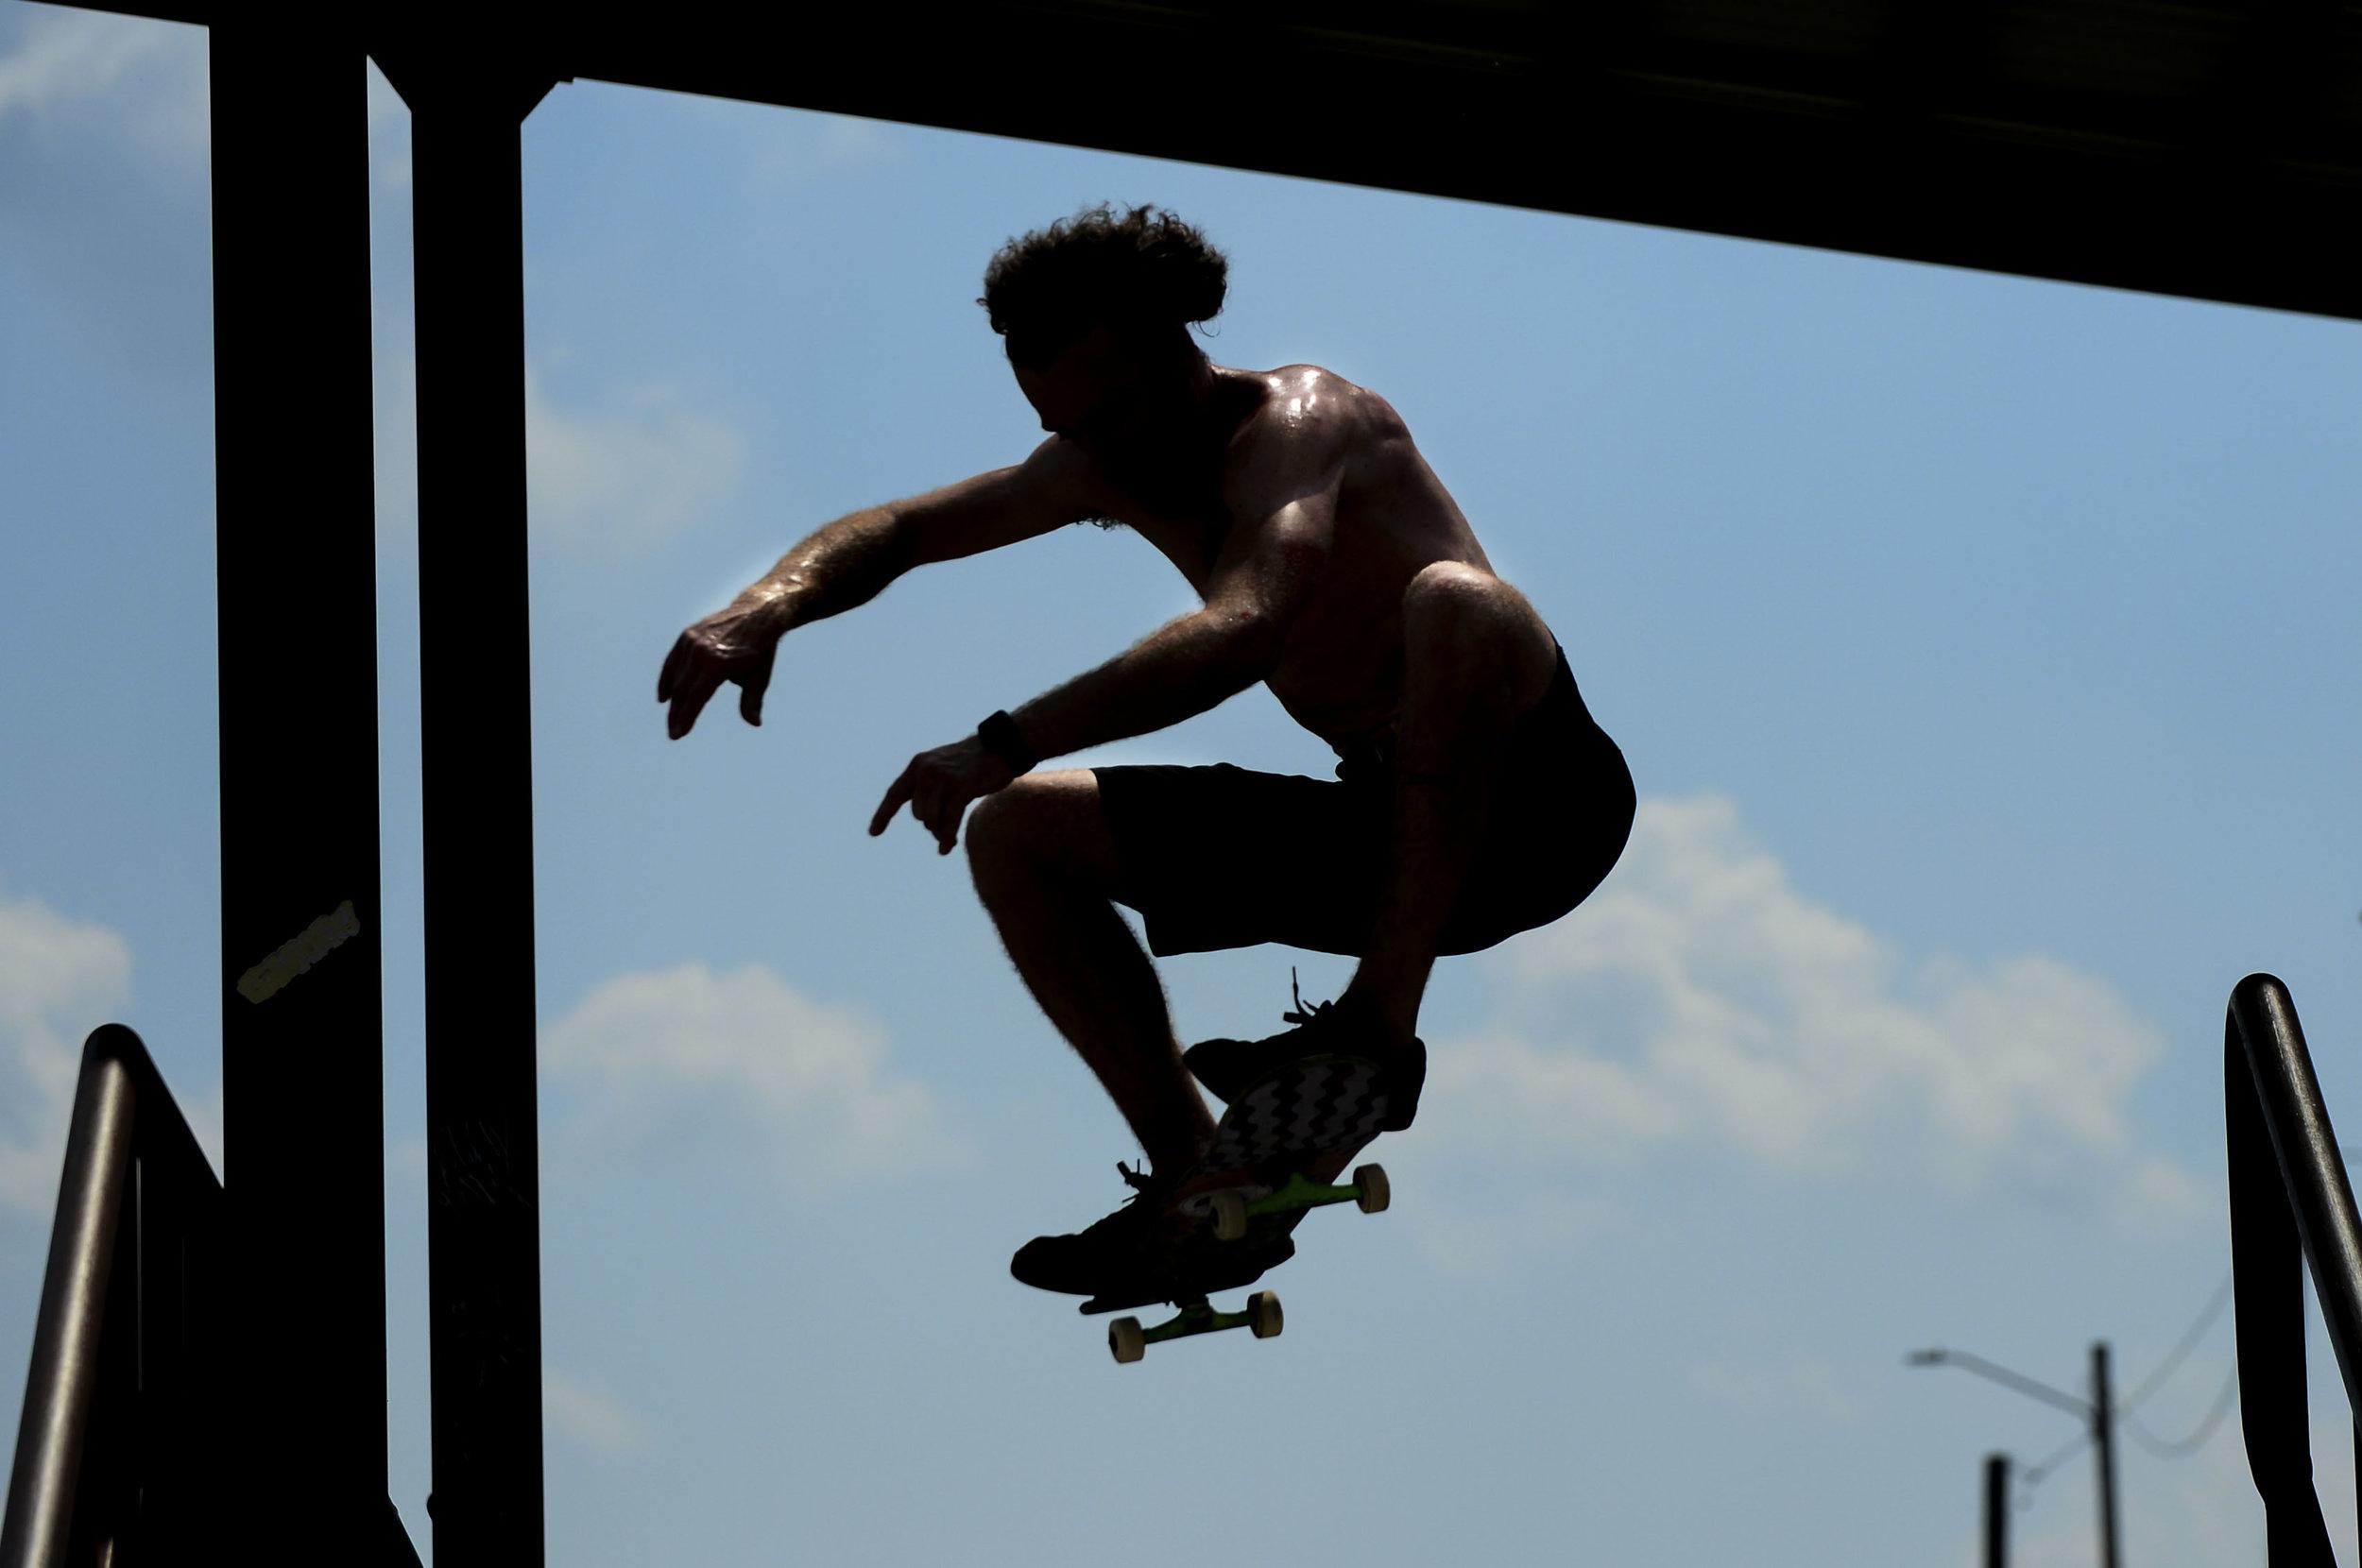 mc-skate-park-monday-stand-alone_223_KH.jpg